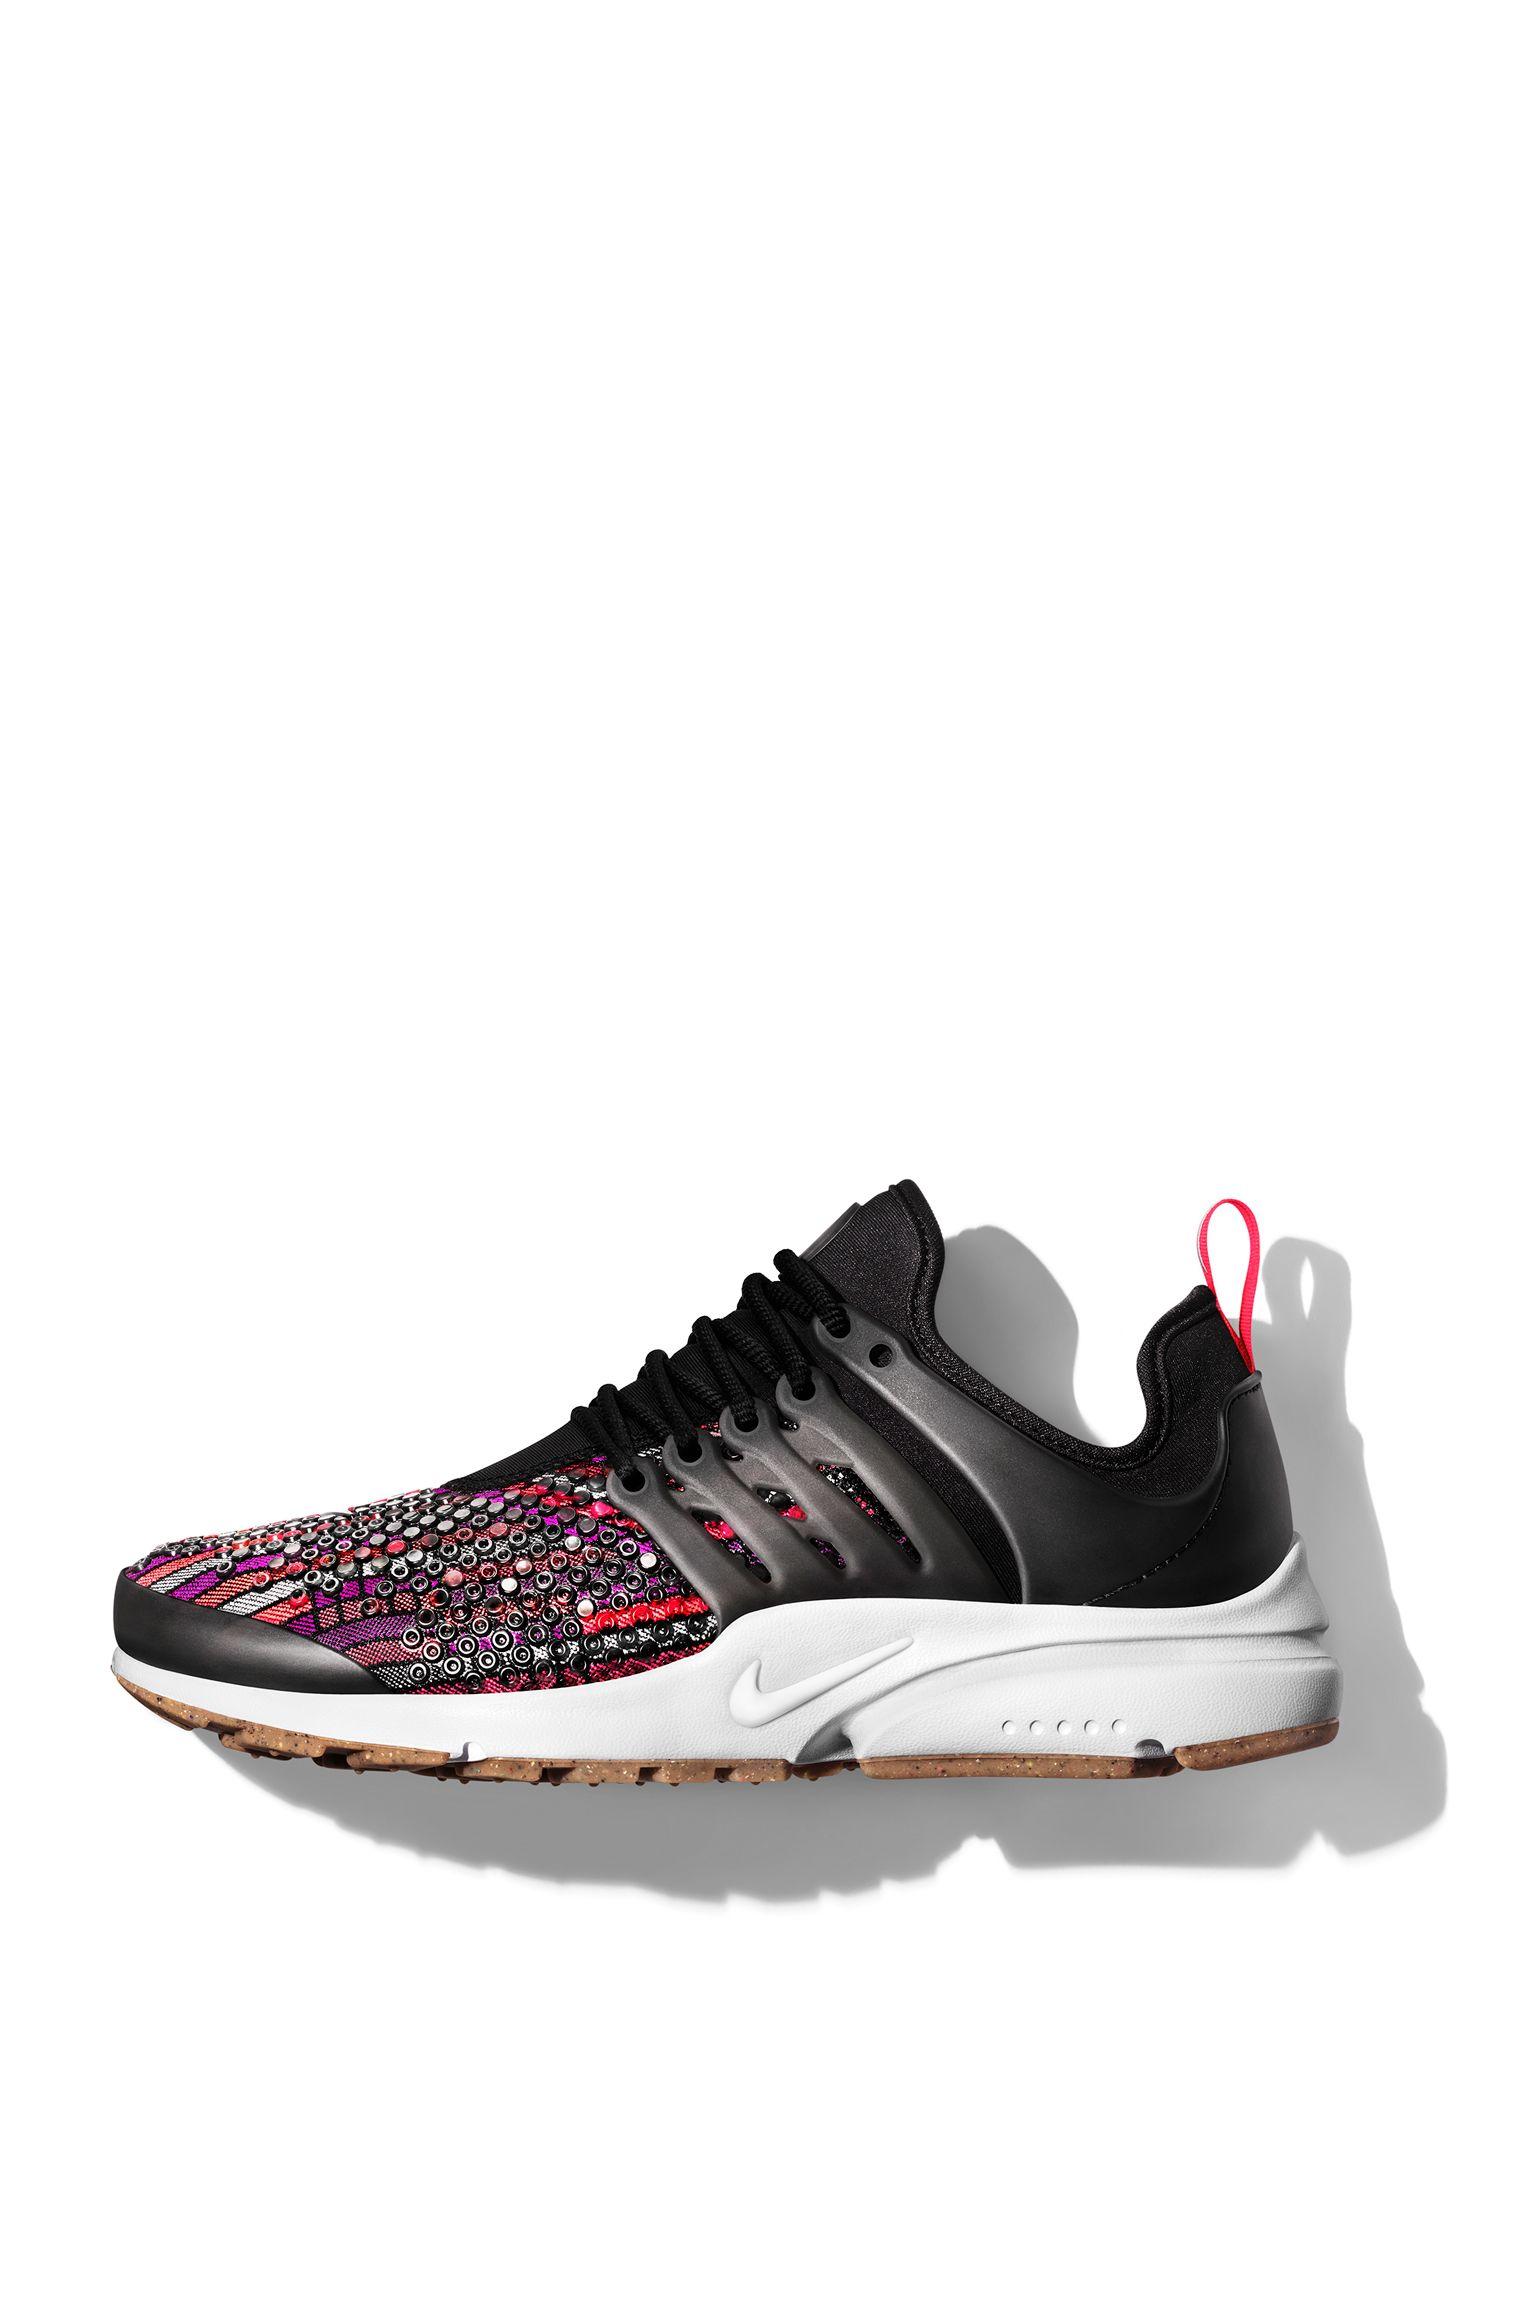 Nike Beautiful x Powerful Jacquard collectie